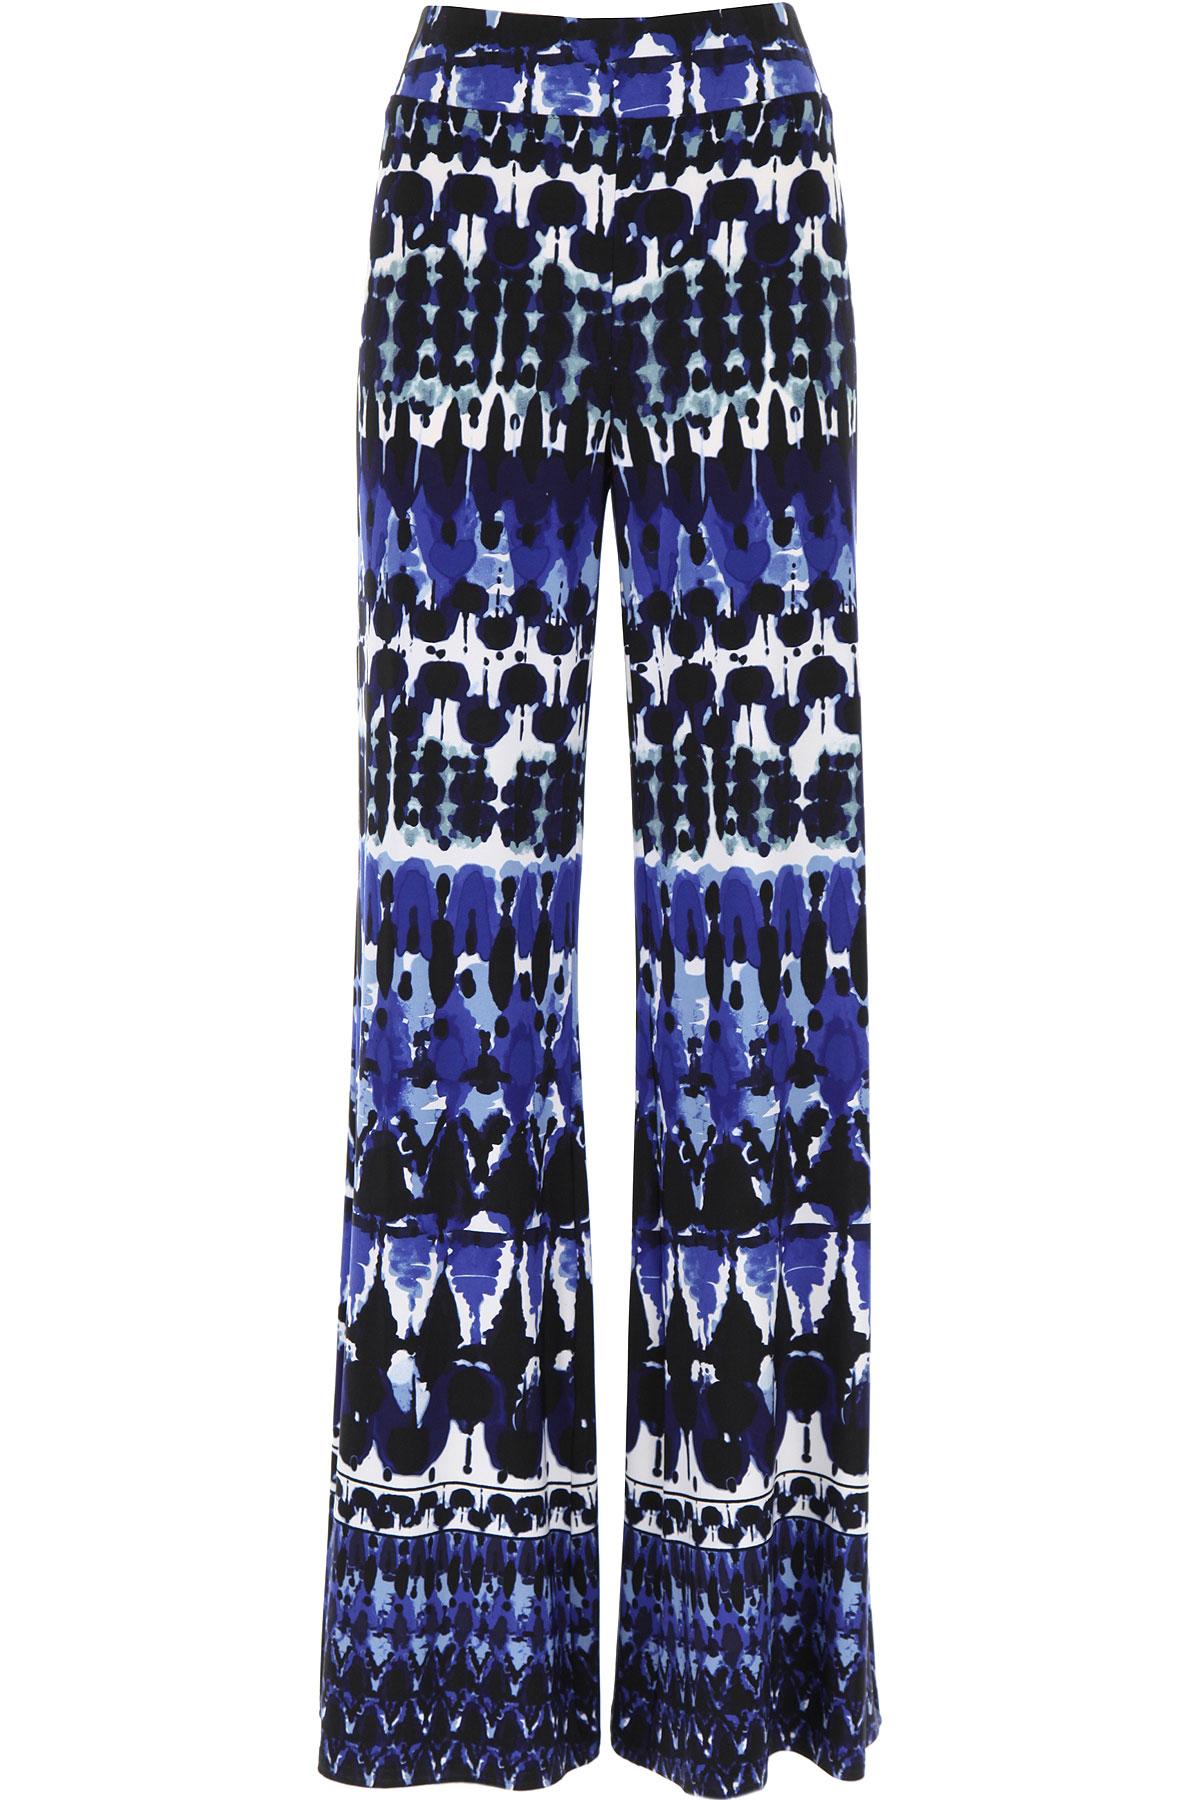 Joseph Ribkoff Pants for Women On Sale, Blue Melange, polyester, 2019, 28 30 32